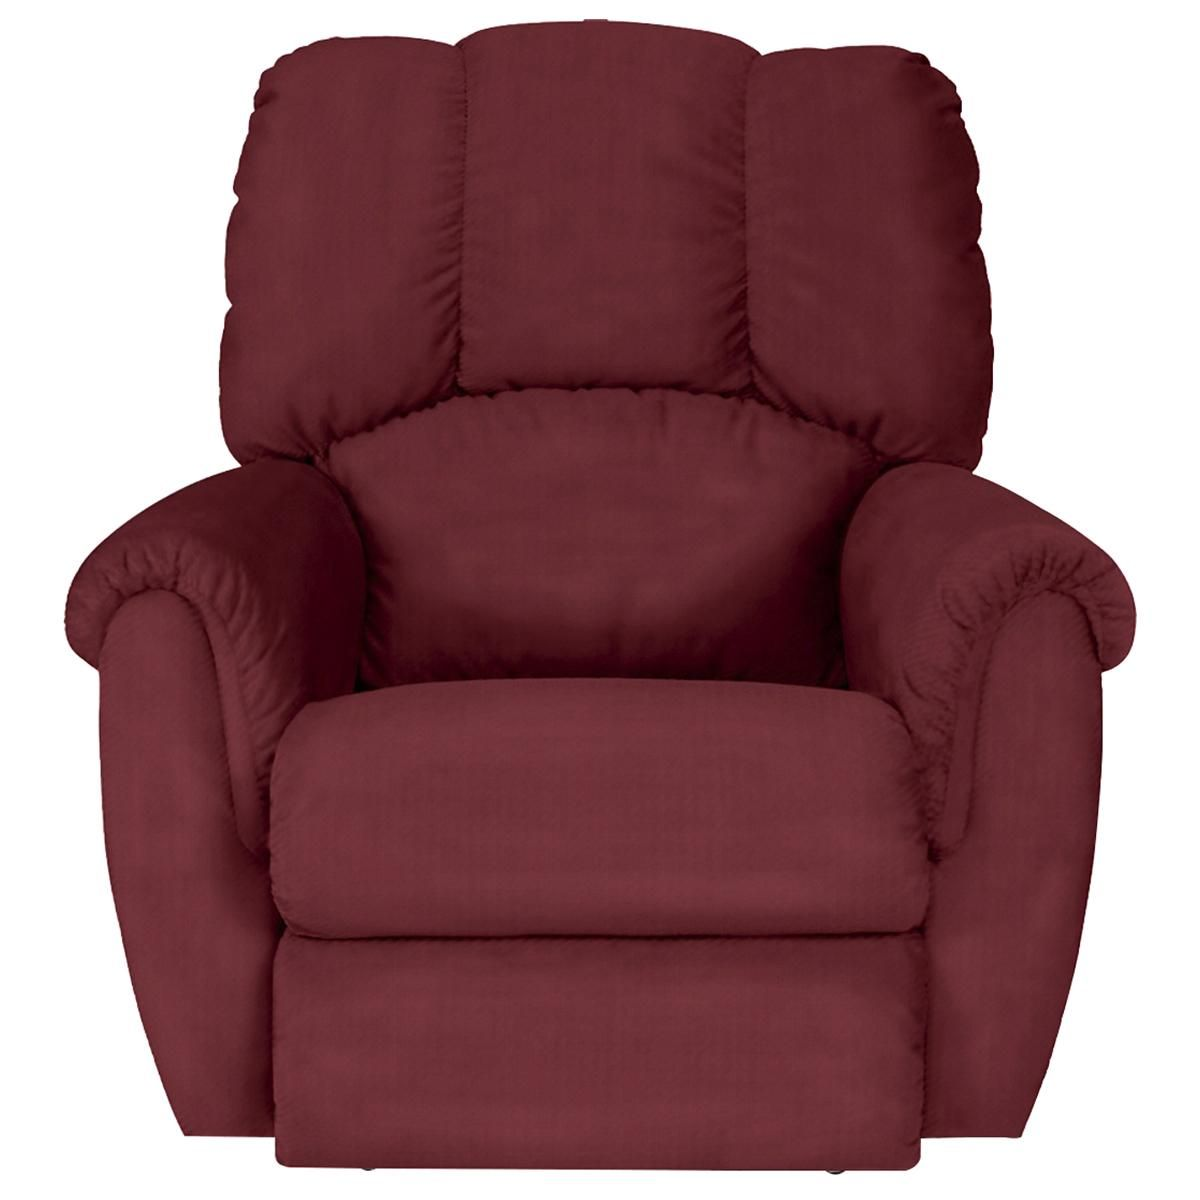 La Z Boy Conner Wall Recliner In Claret Nebraska Furniture Mart Rocker Recliners Recliner Best Chair For Posture